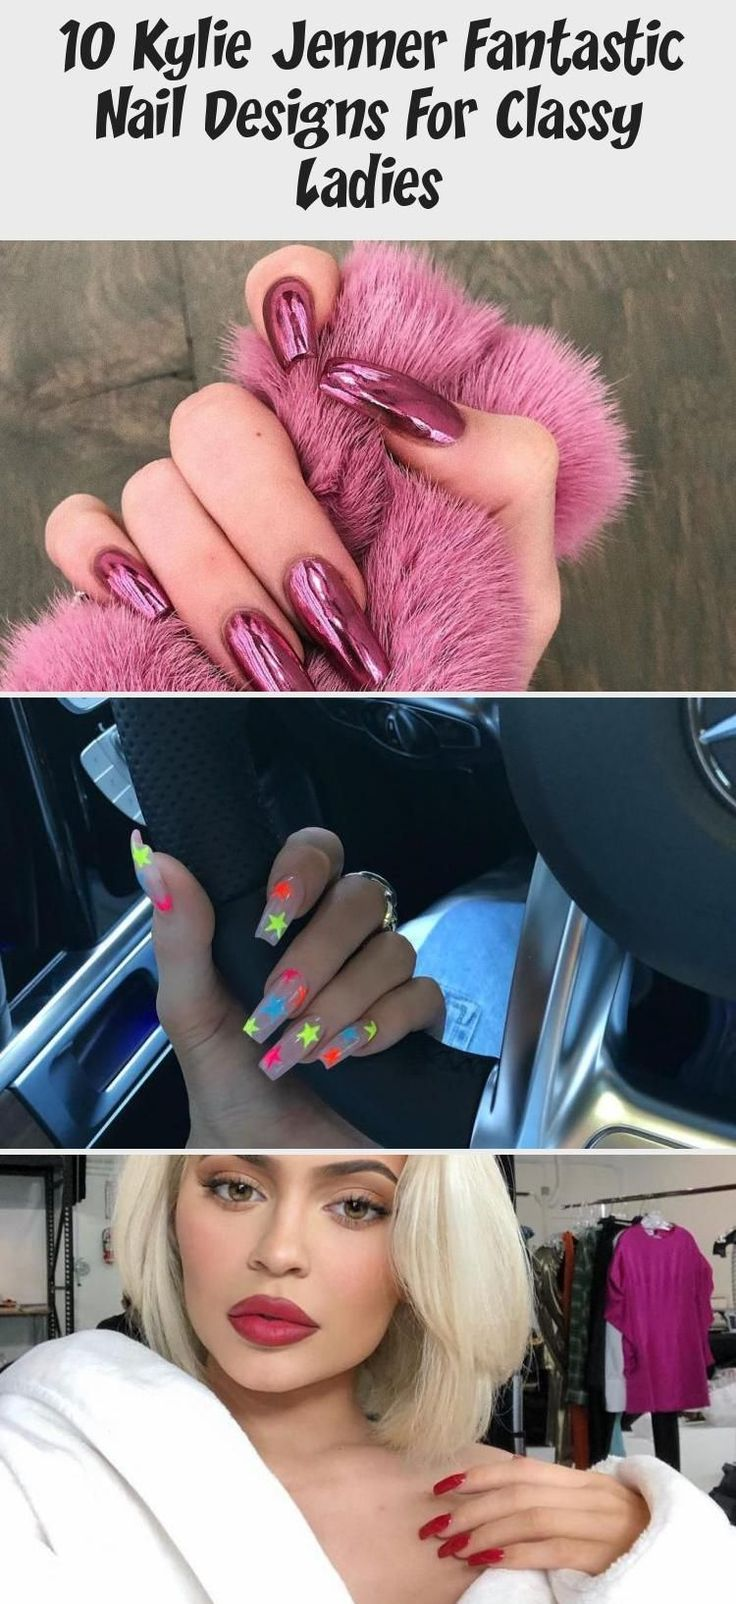 10 Kylie Jenner Fantastic Nail Designs For Classy Ladies #naildesignGrey #naildesignEasy #Crazynaildesign #naildesignChr…